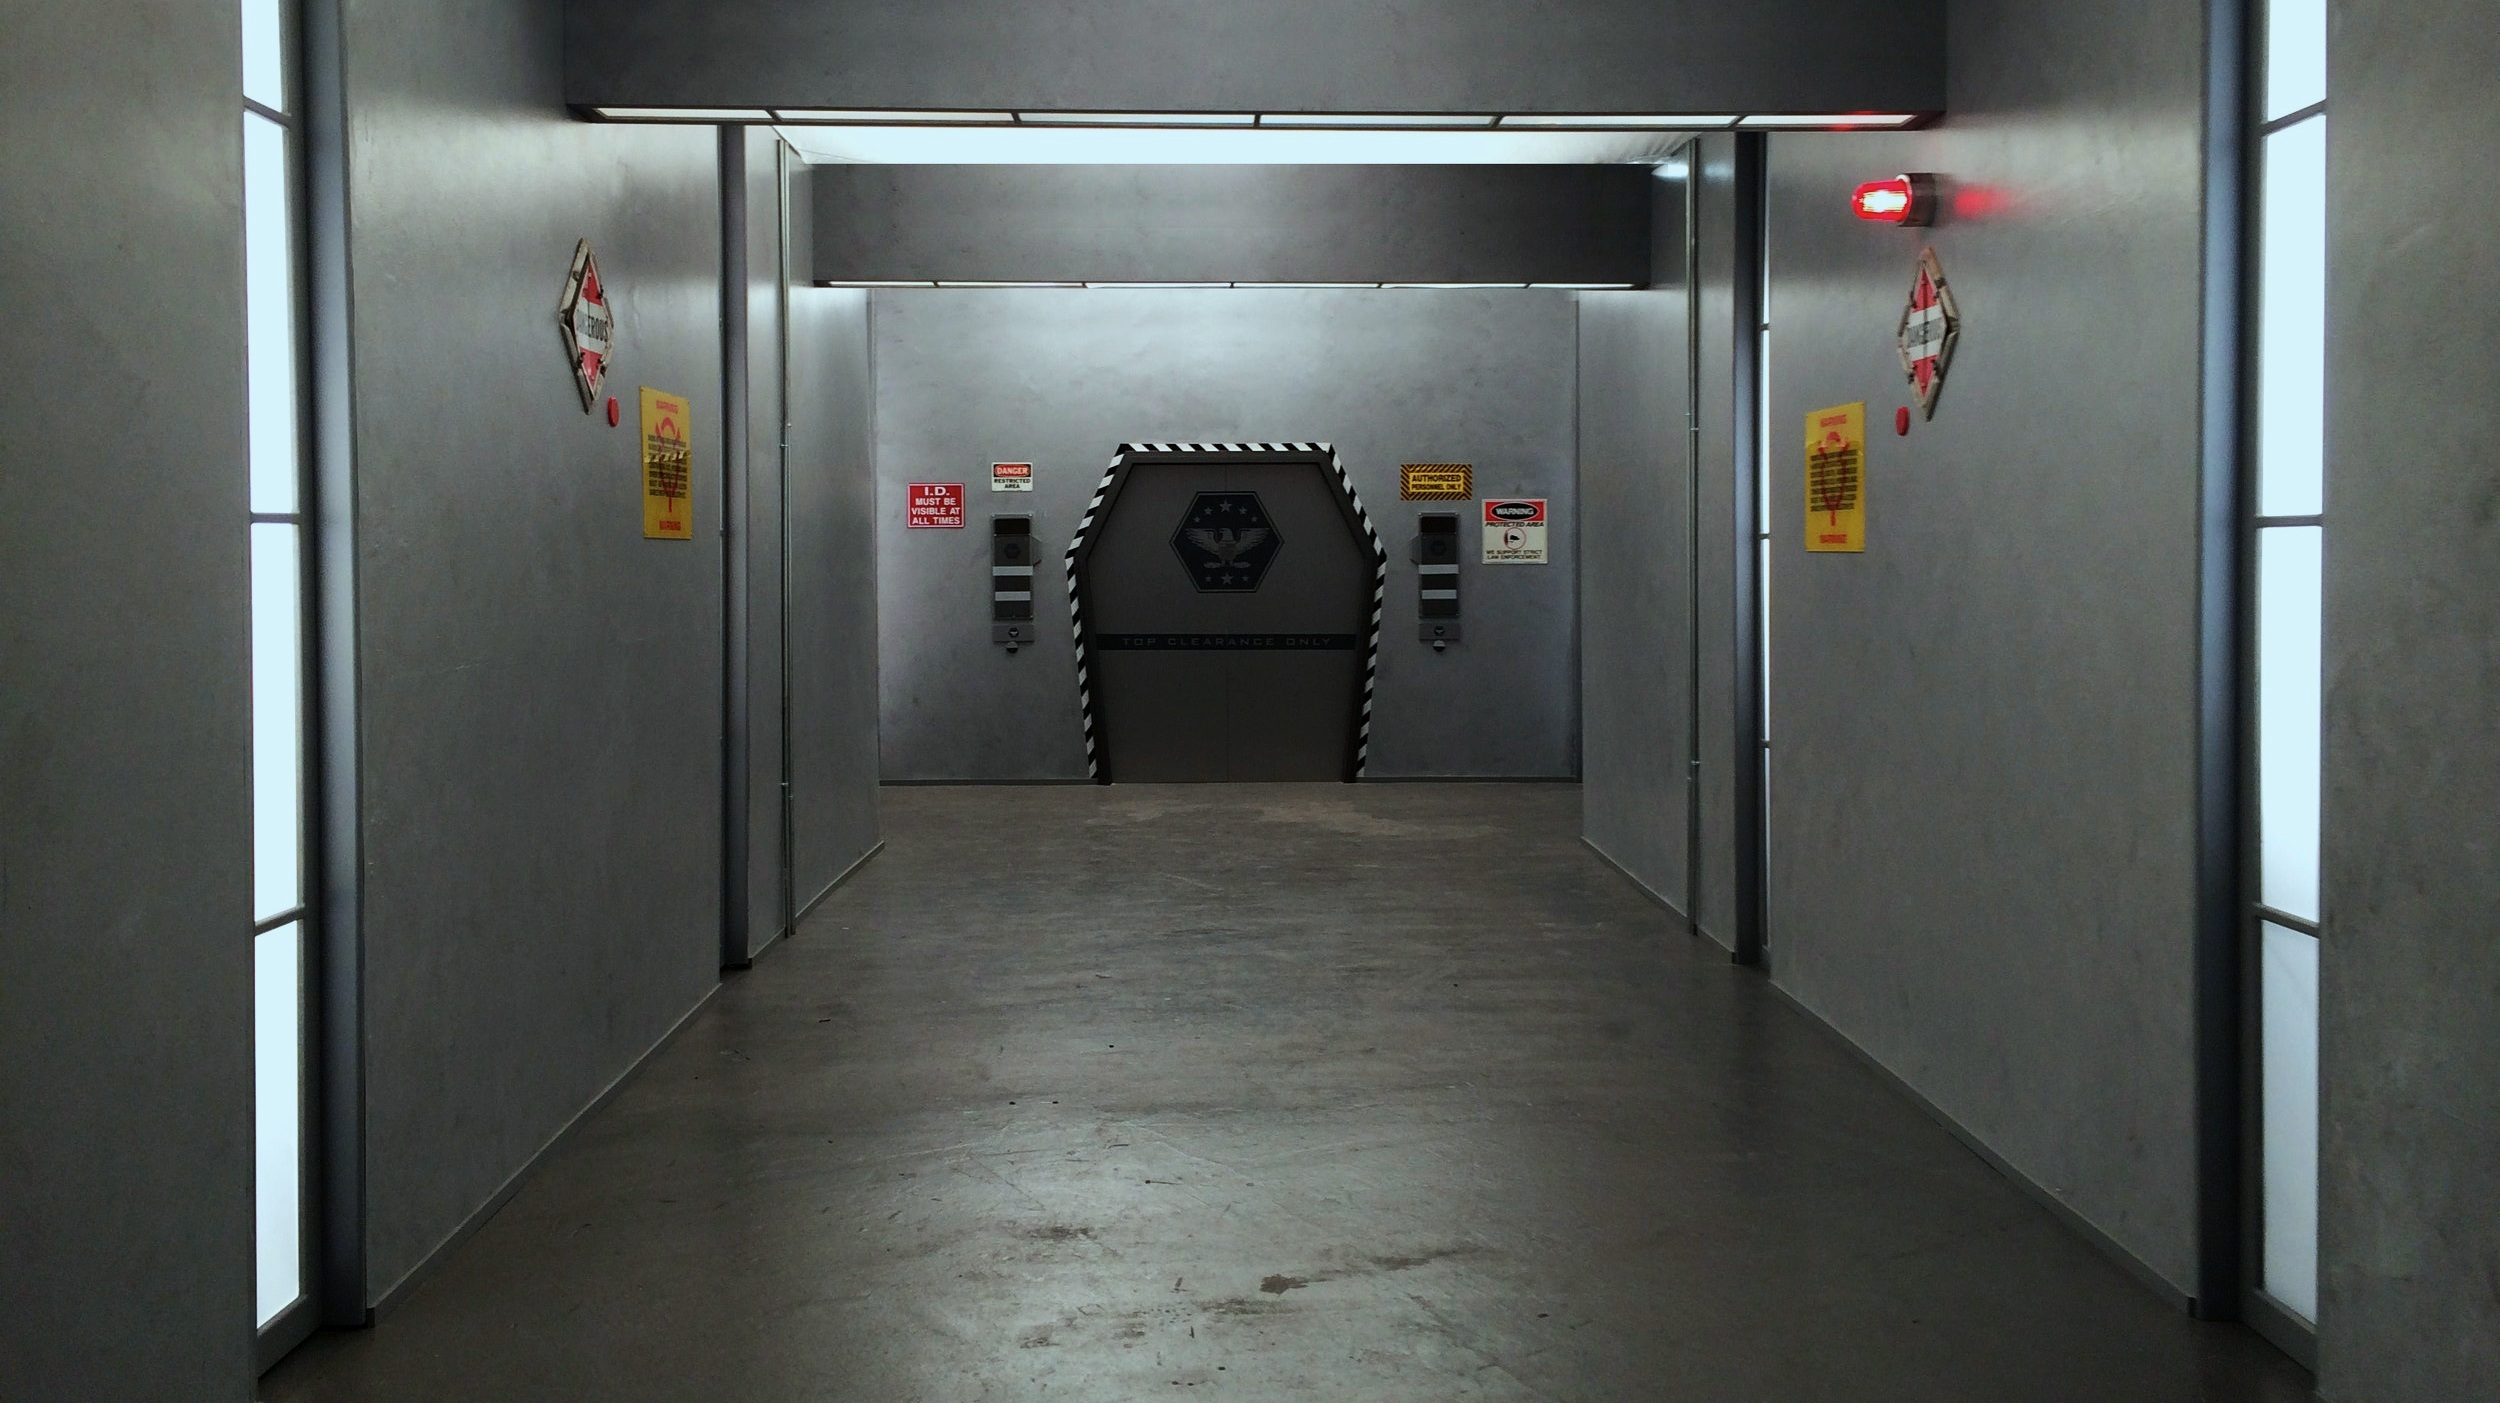 rj hallway.jpg